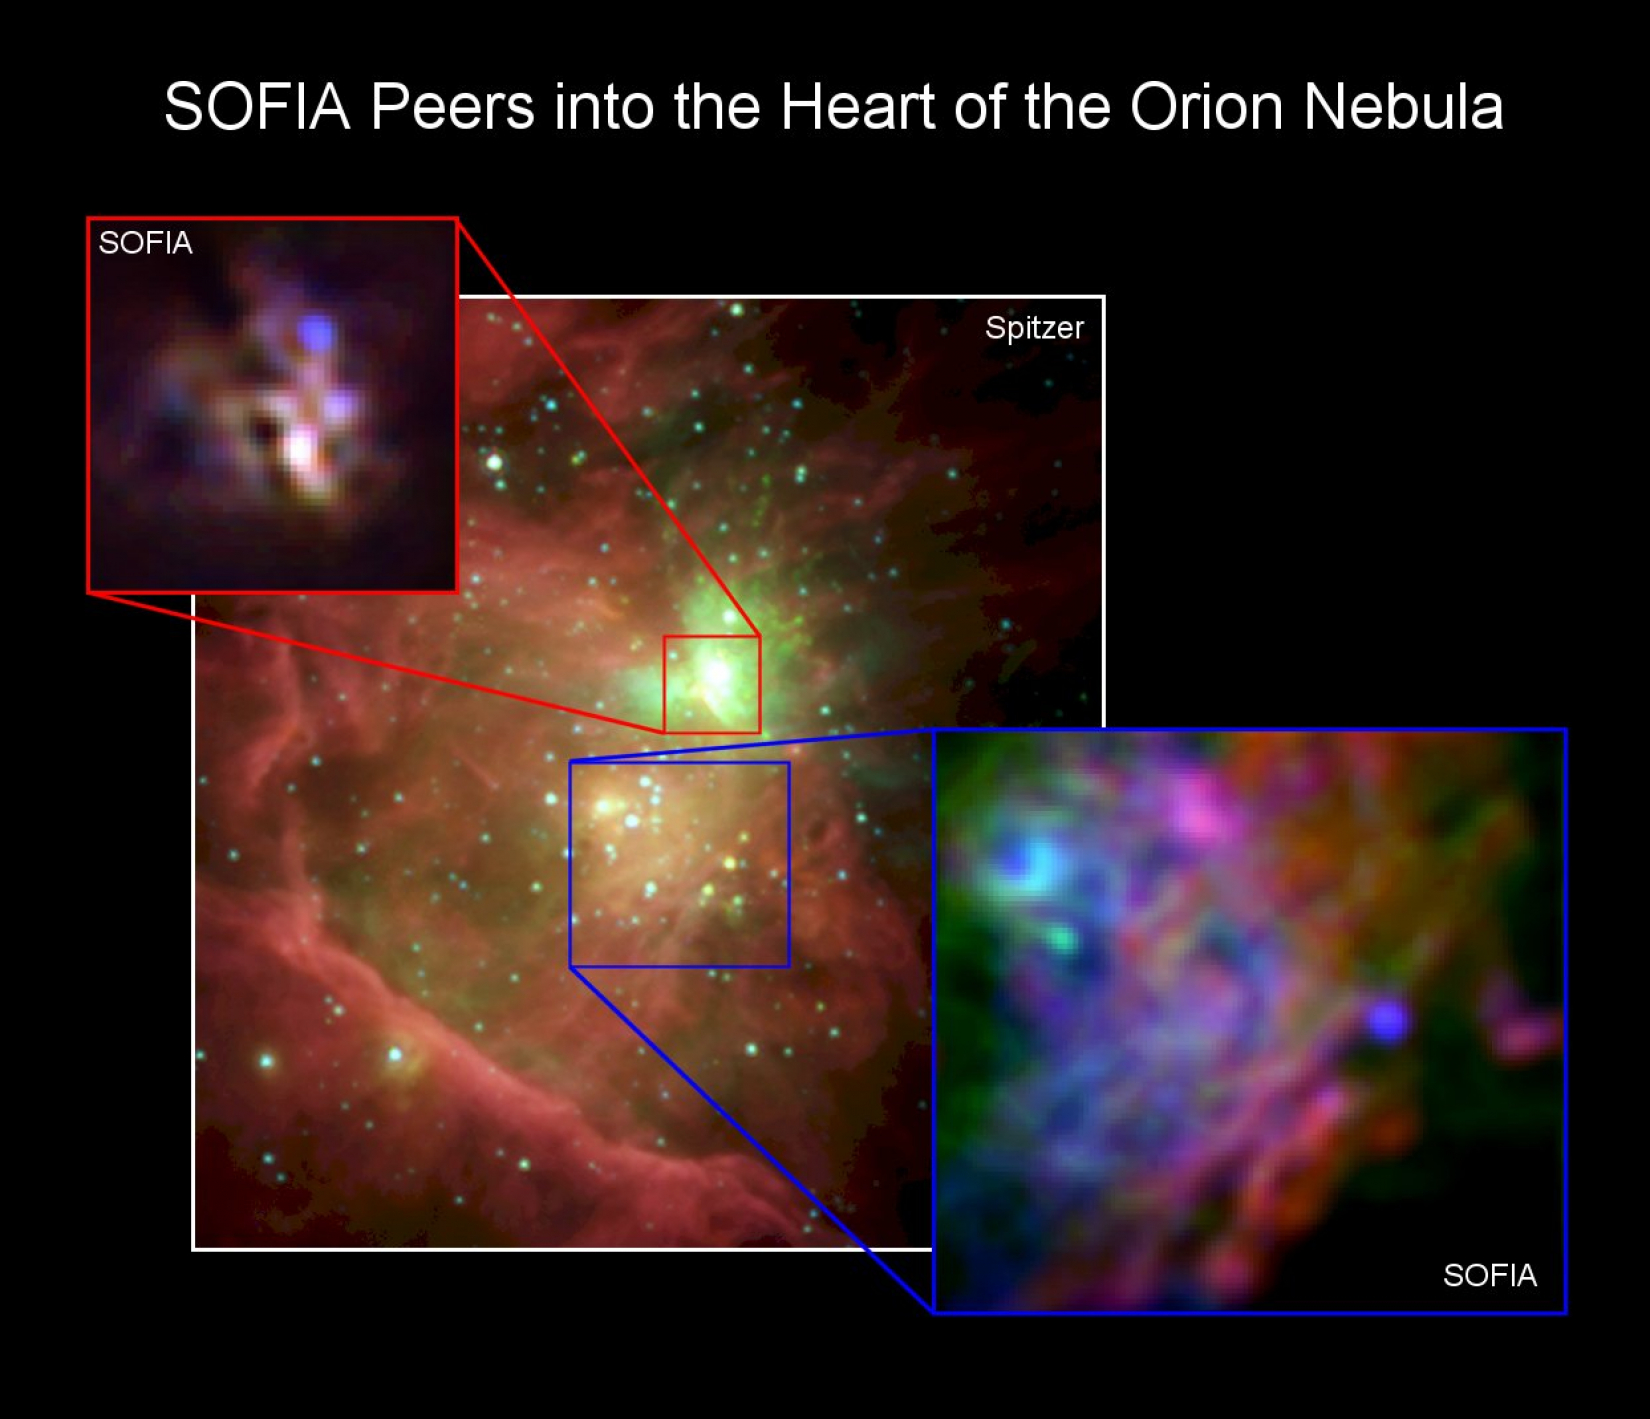 SOFIA Peers into the Heart of the Orion Nebula